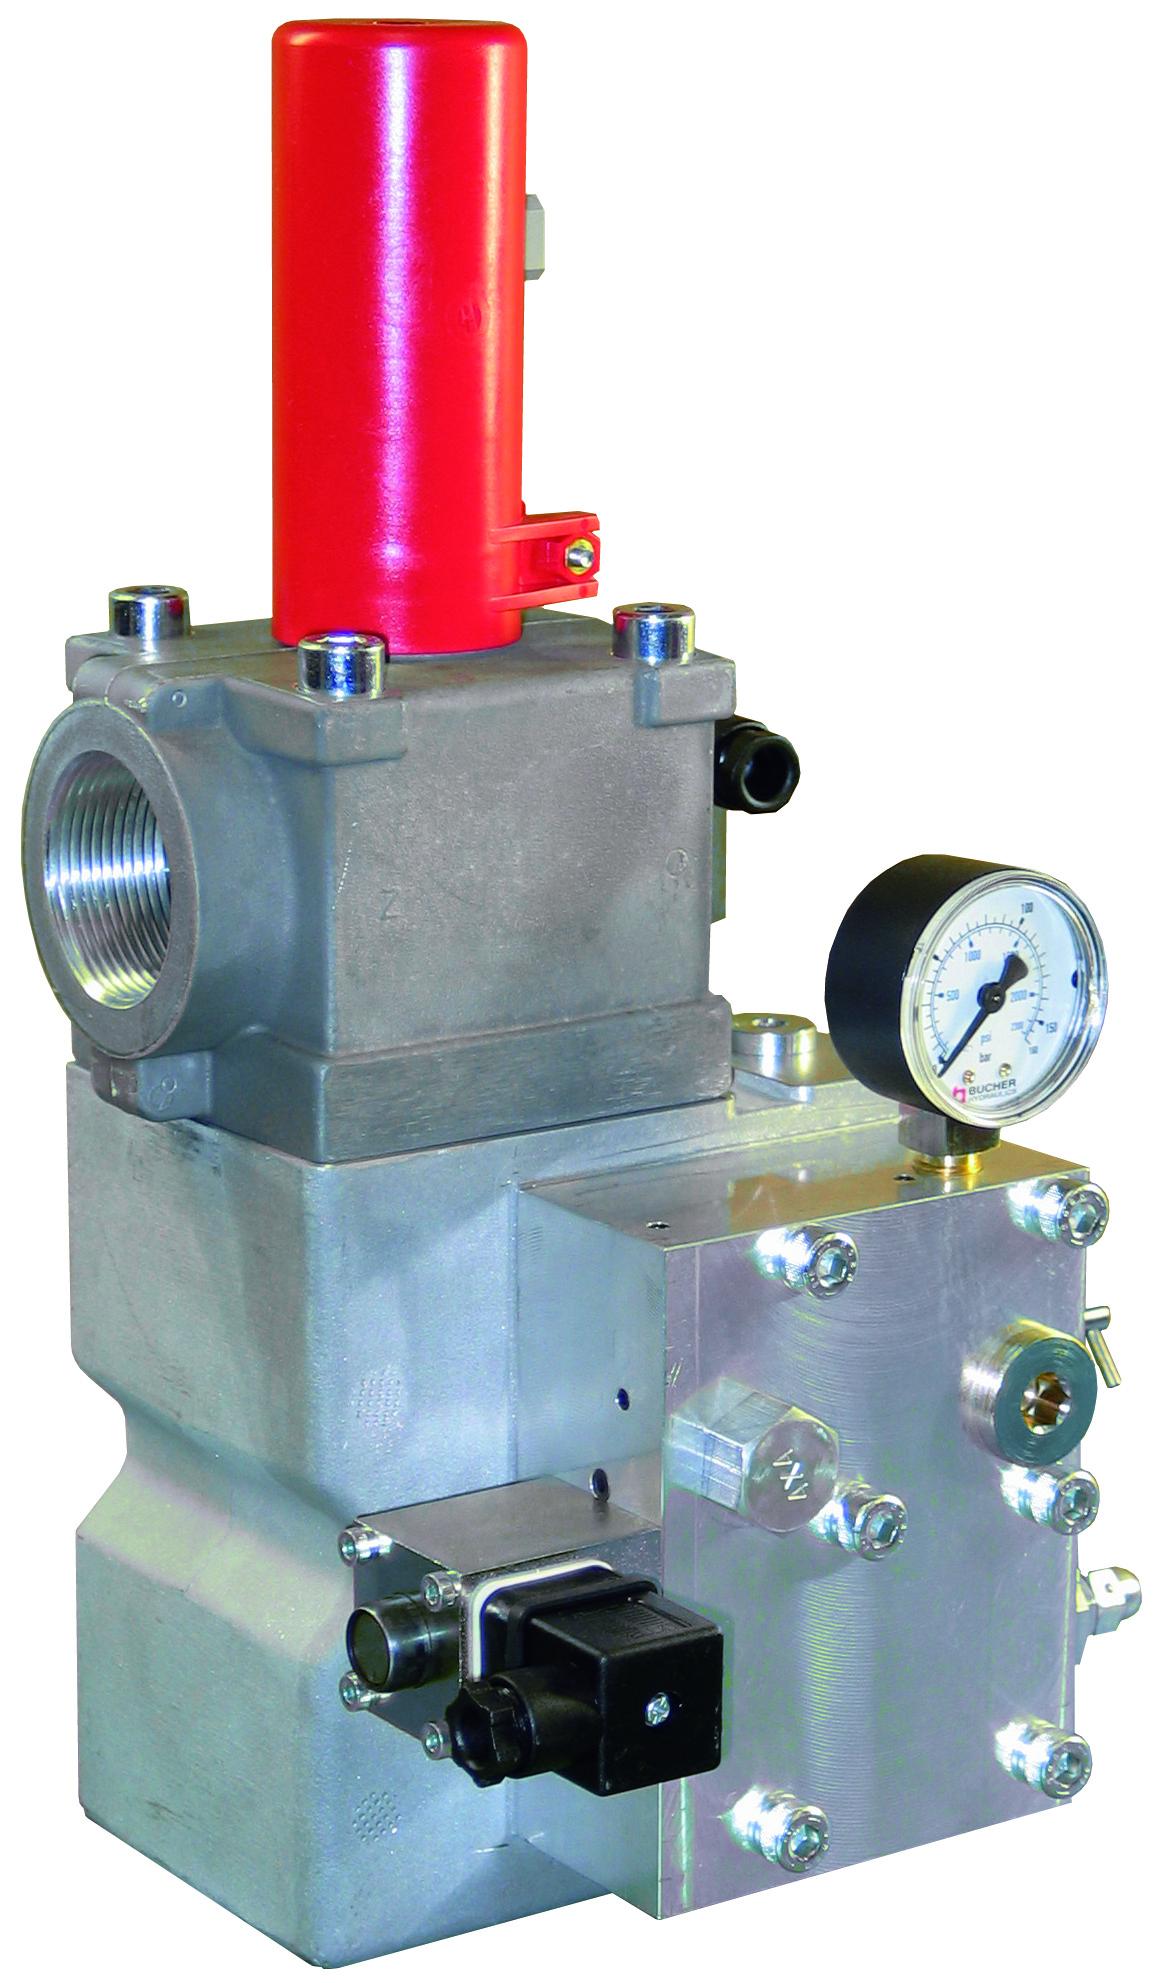 vf_ventil_grau?width=155 bucher hydraulics elevator hydraulic products valves vf lrv bucher hydraulic pump wiring diagram at gsmx.co